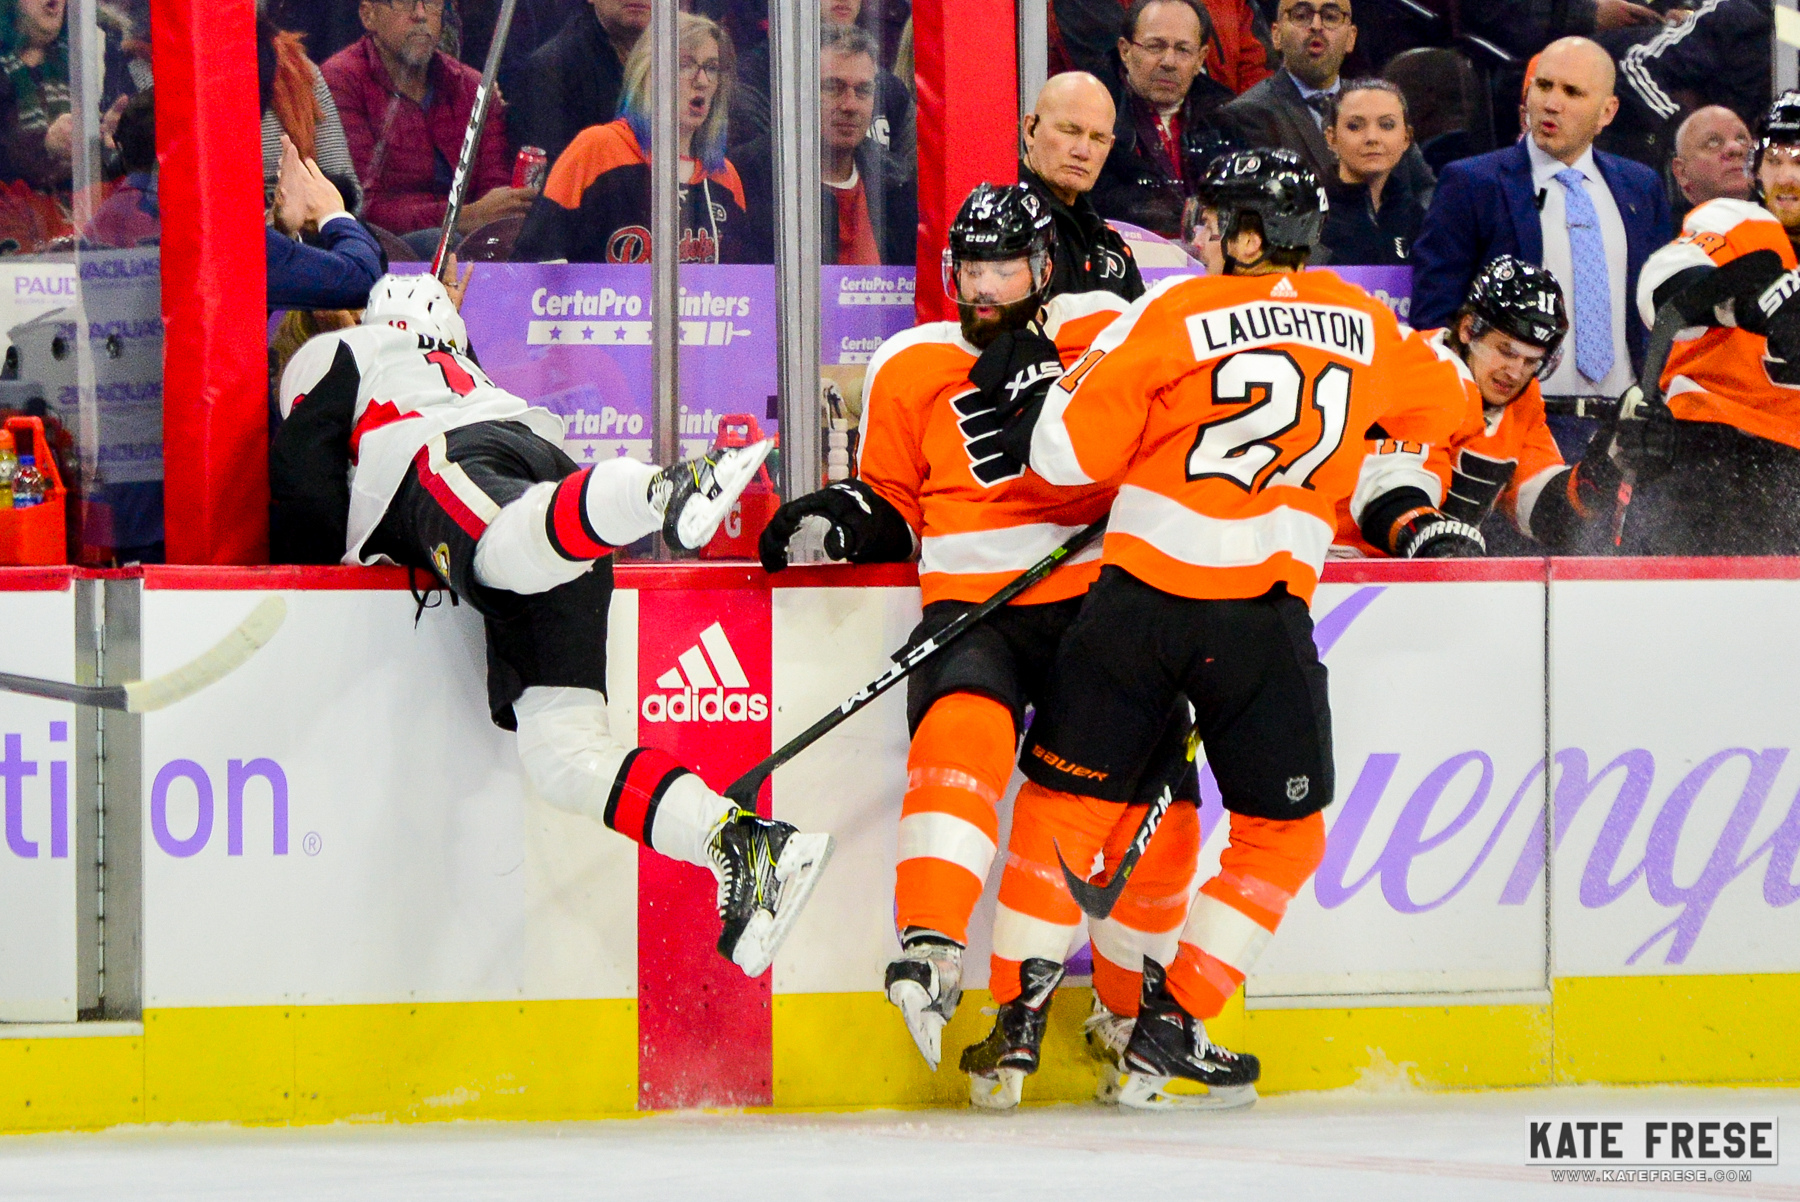 11-27-2018_FlyersvsSenators_1st_credKate